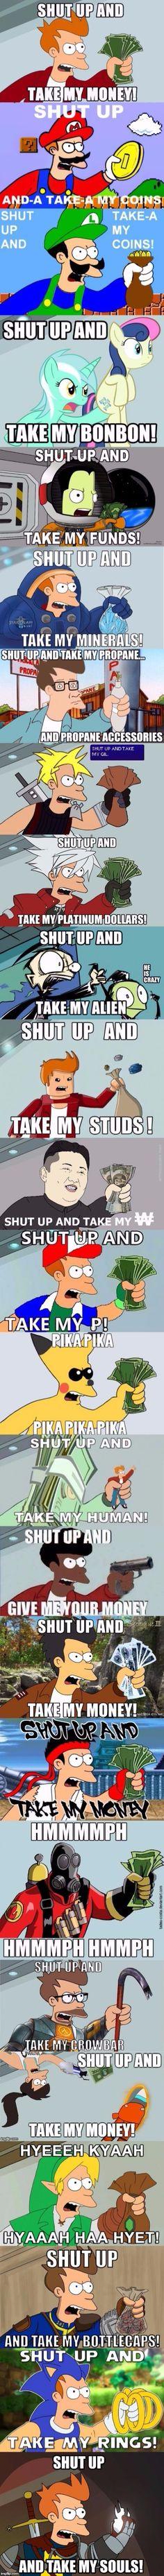 Shut Up Revolution Has Begun! (New & Improved) | . | image tagged in shut up revolution has begun,memes,shut up and take my money,shut up and take my money fry,futurama fry,fry | made w/ Imgflip meme maker